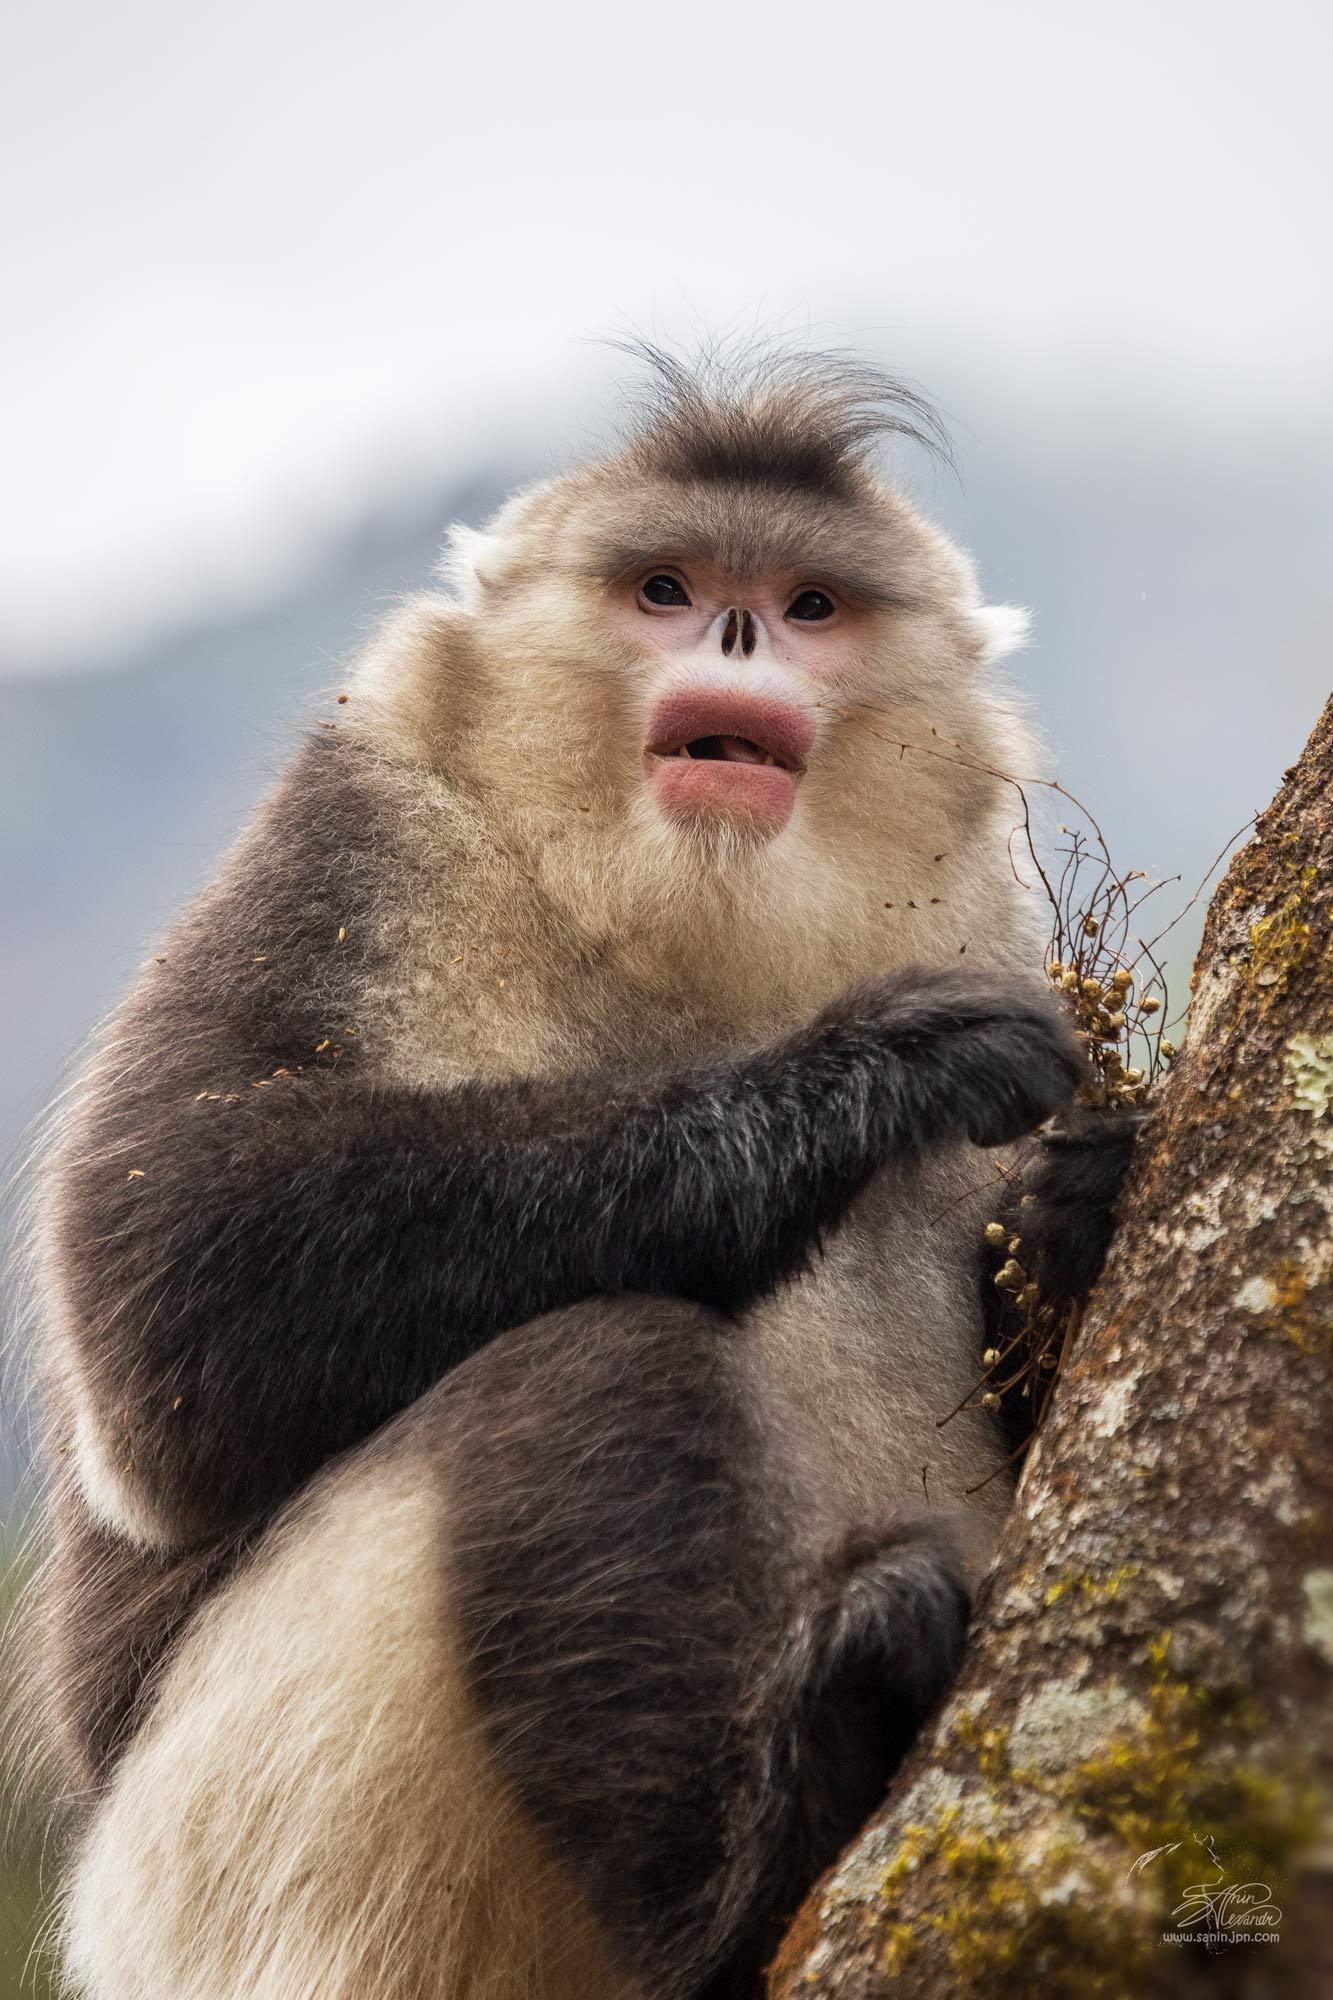 Yunan snub-nosed monkey